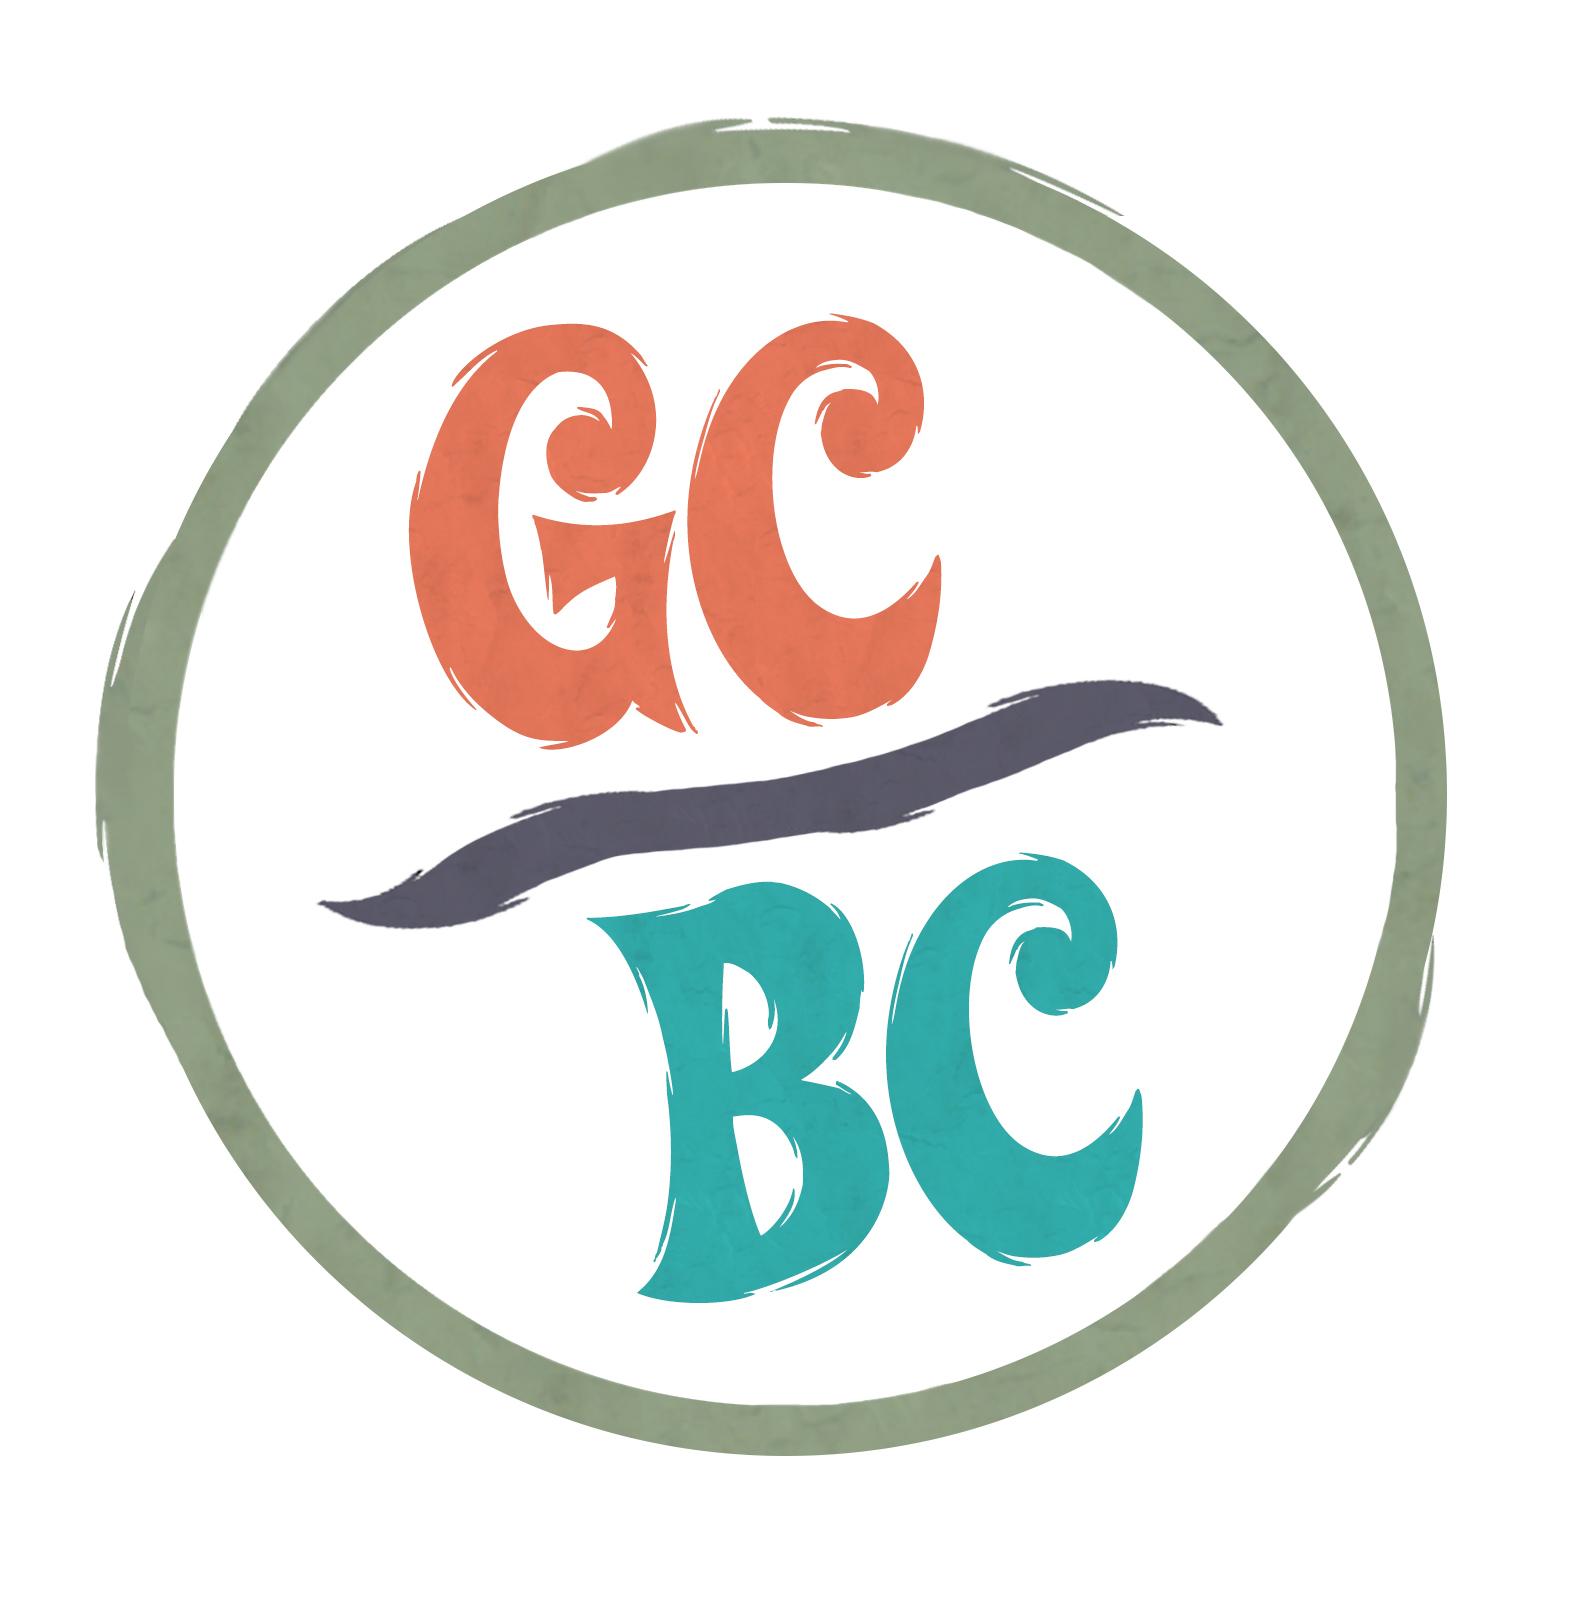 Gcbc10 Logo Flat